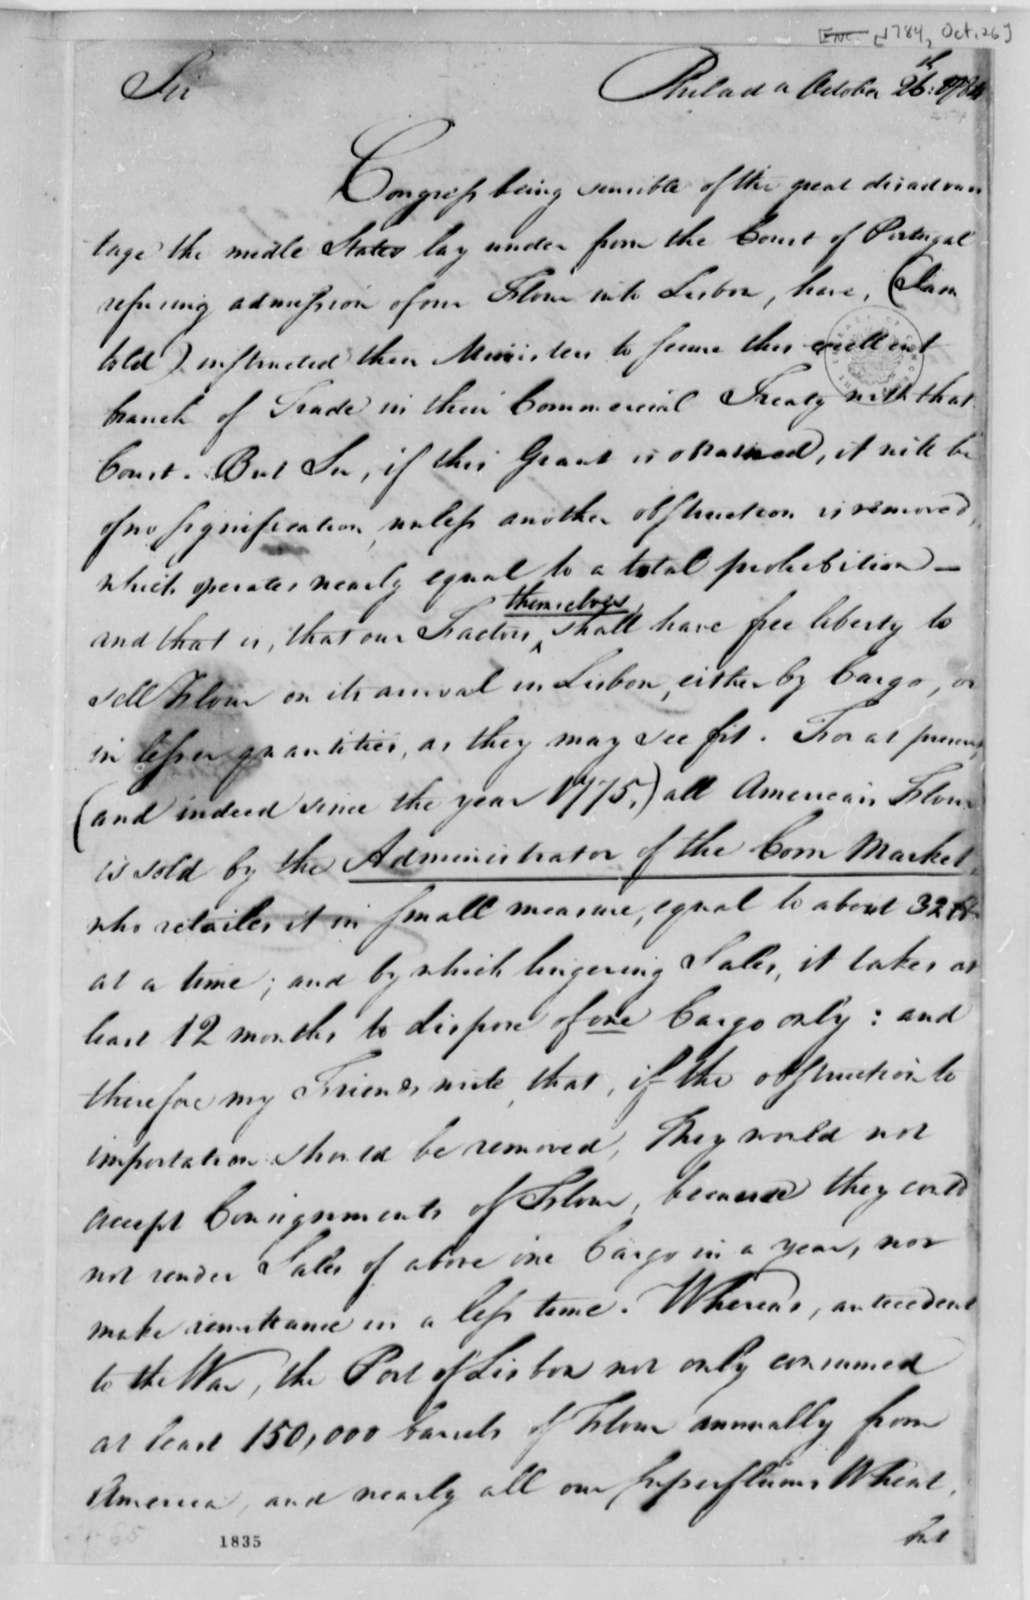 Joseph Wharton to Charles Thomson, October 26, 1784